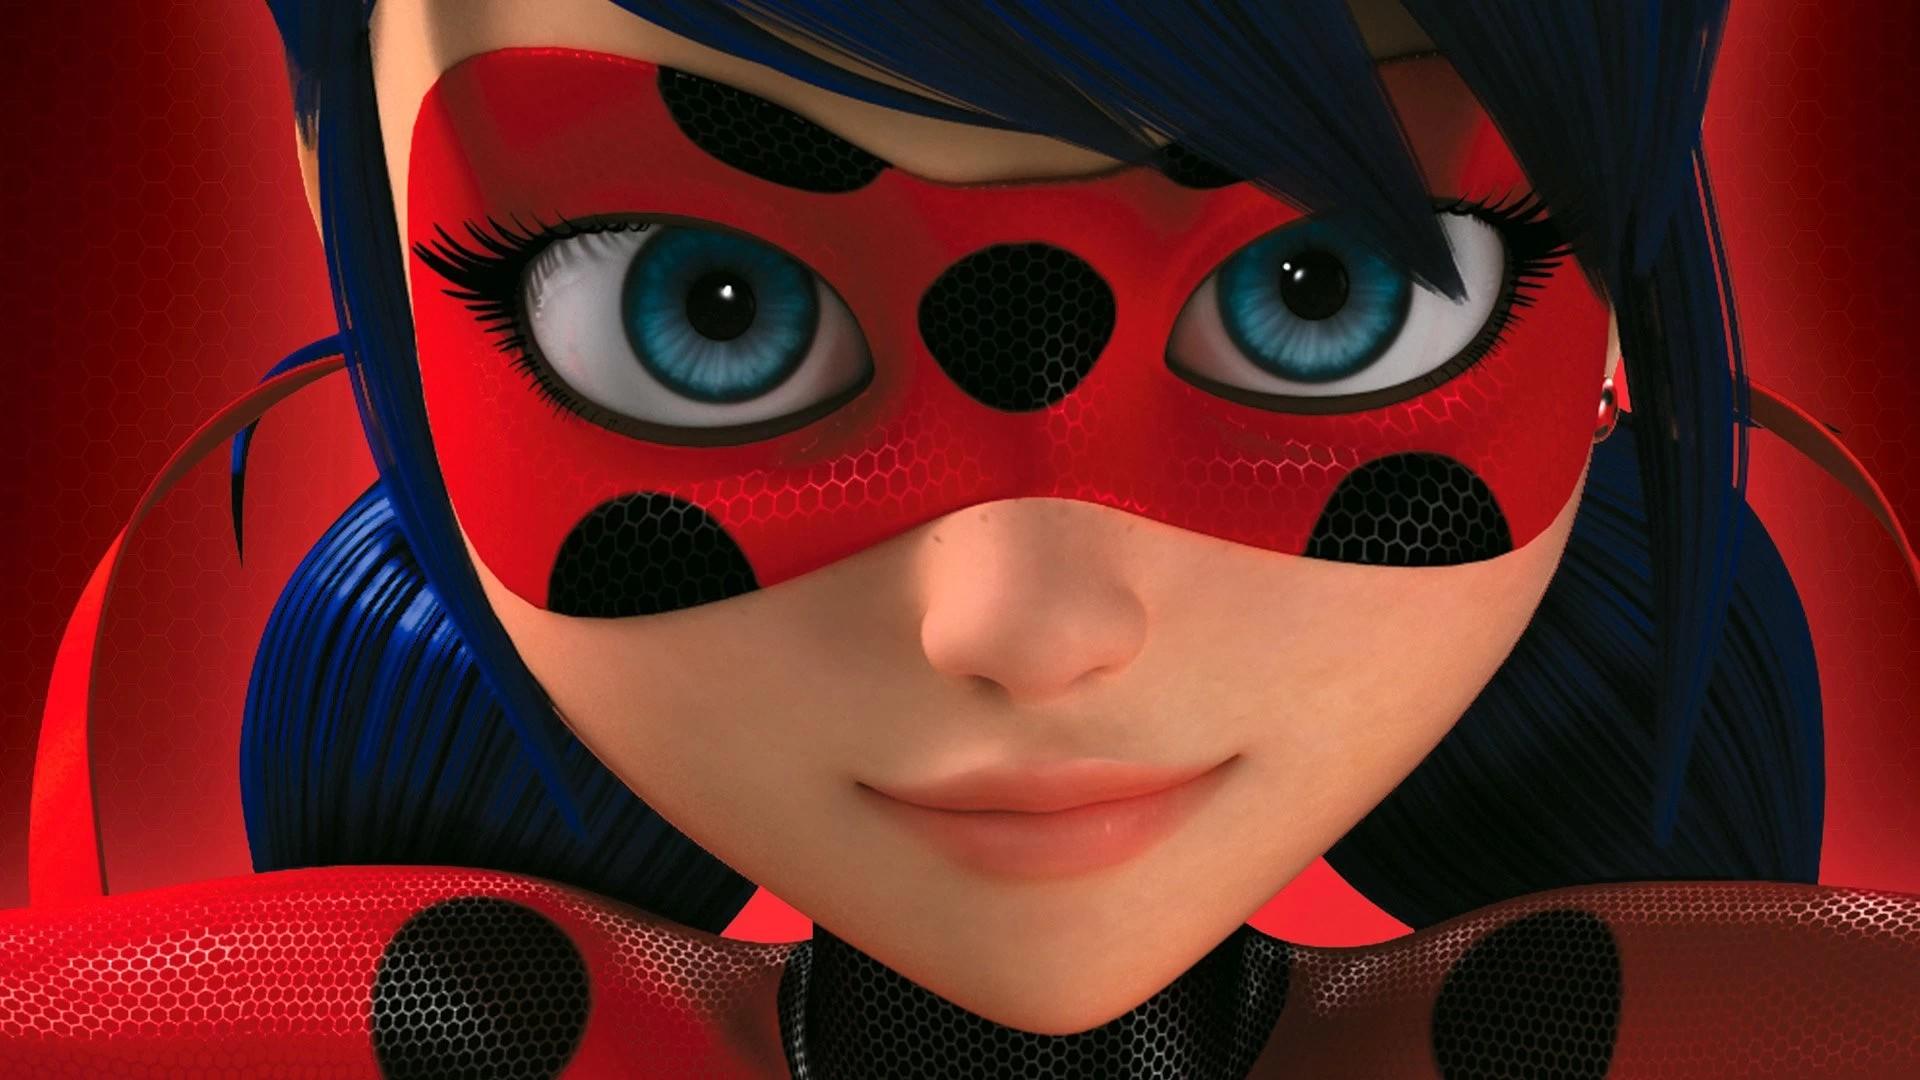 Miraculous Ladybug Shanghai Lady Dragon special - new